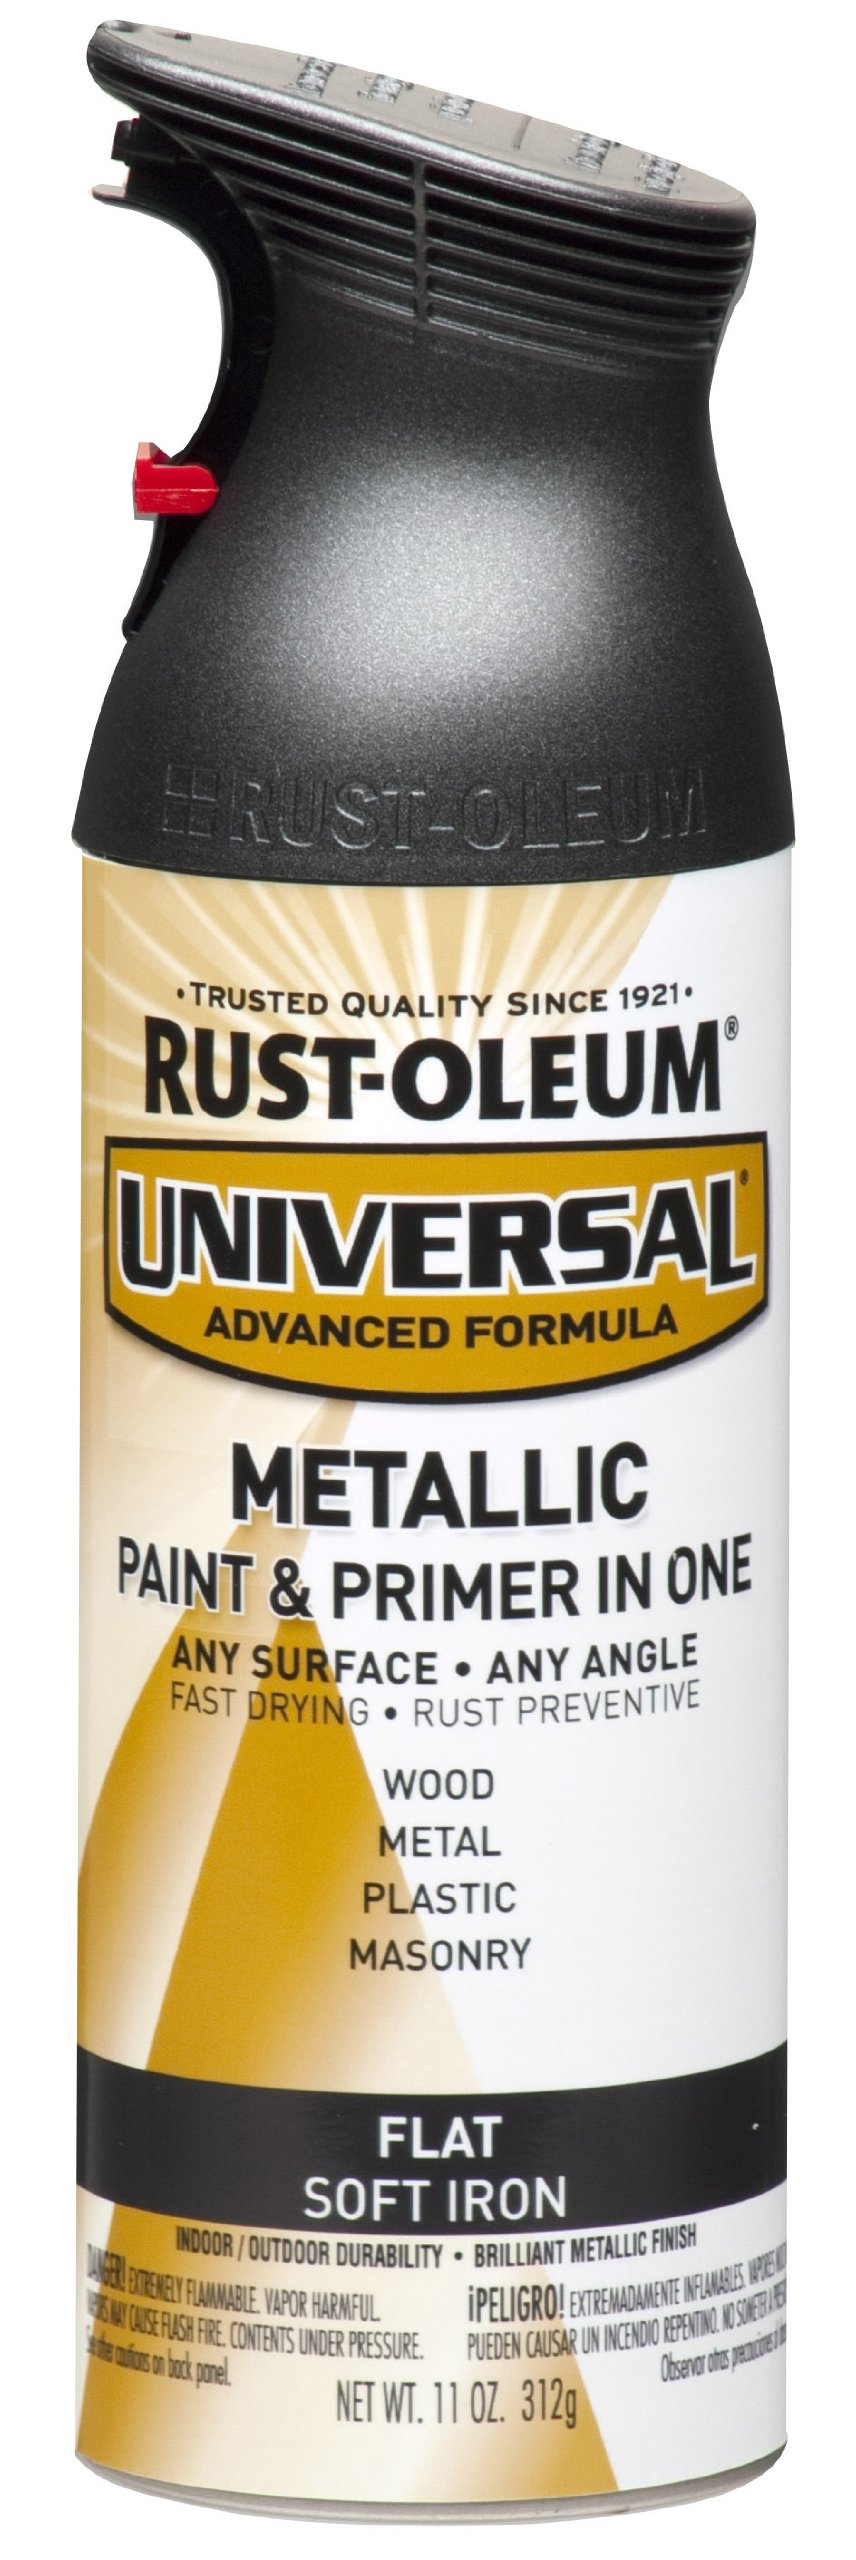 Rust-Oleum 271473 Universal All Surface Spray Paint, 11 oz, Metallic, Flat Soft Iron